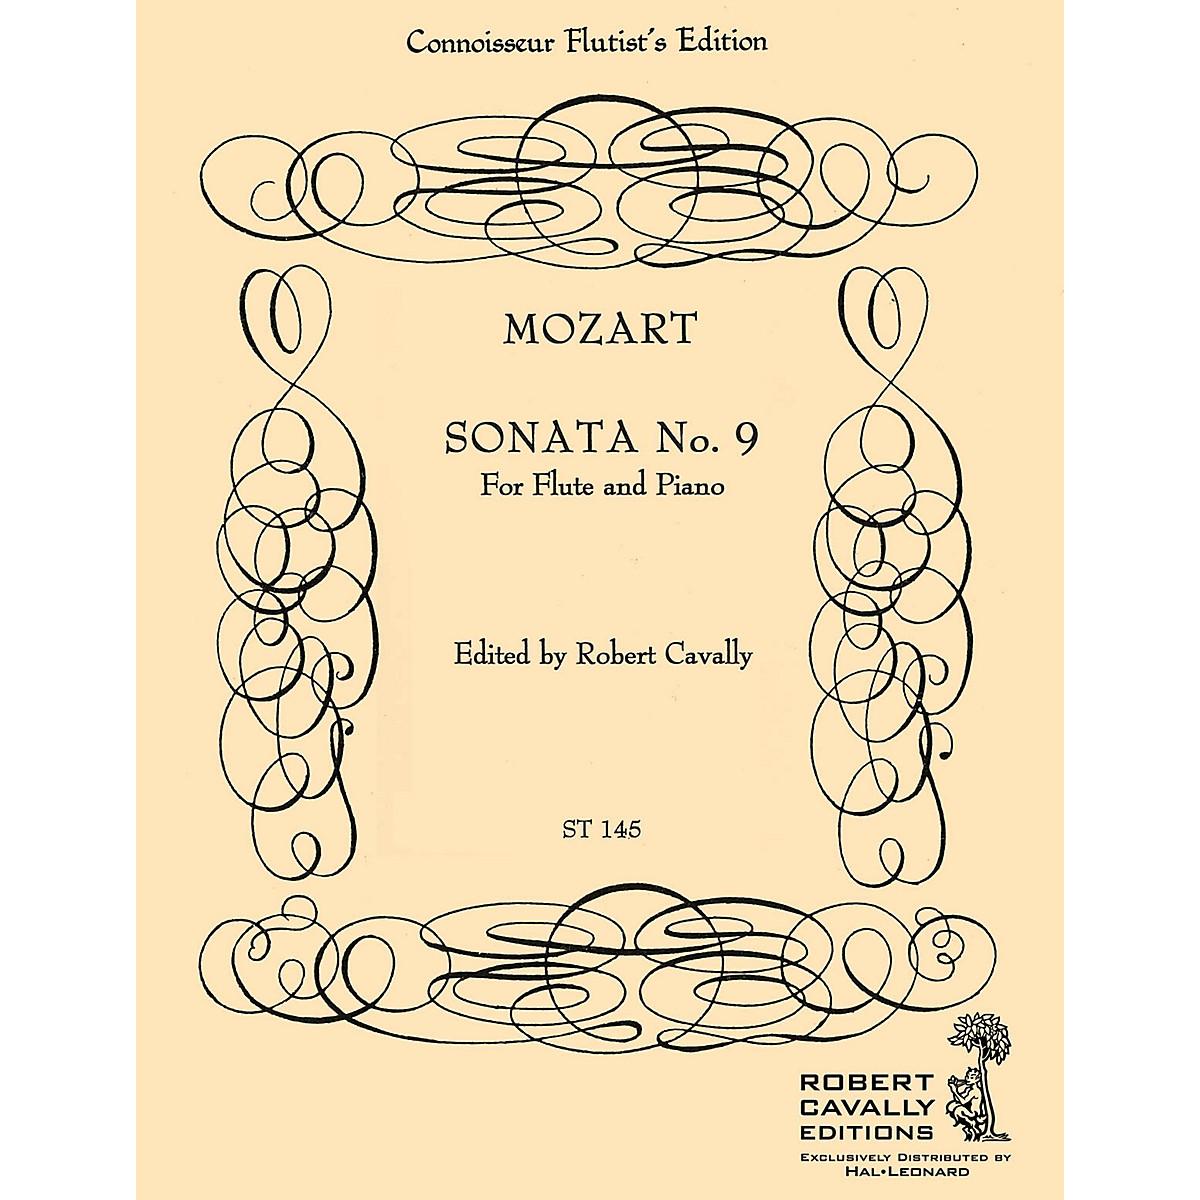 Cavally Editions Sonata No. 9 in C (Connoisseur Flutist's Edition) Robert Cavally Editions Series by Robert Cavally